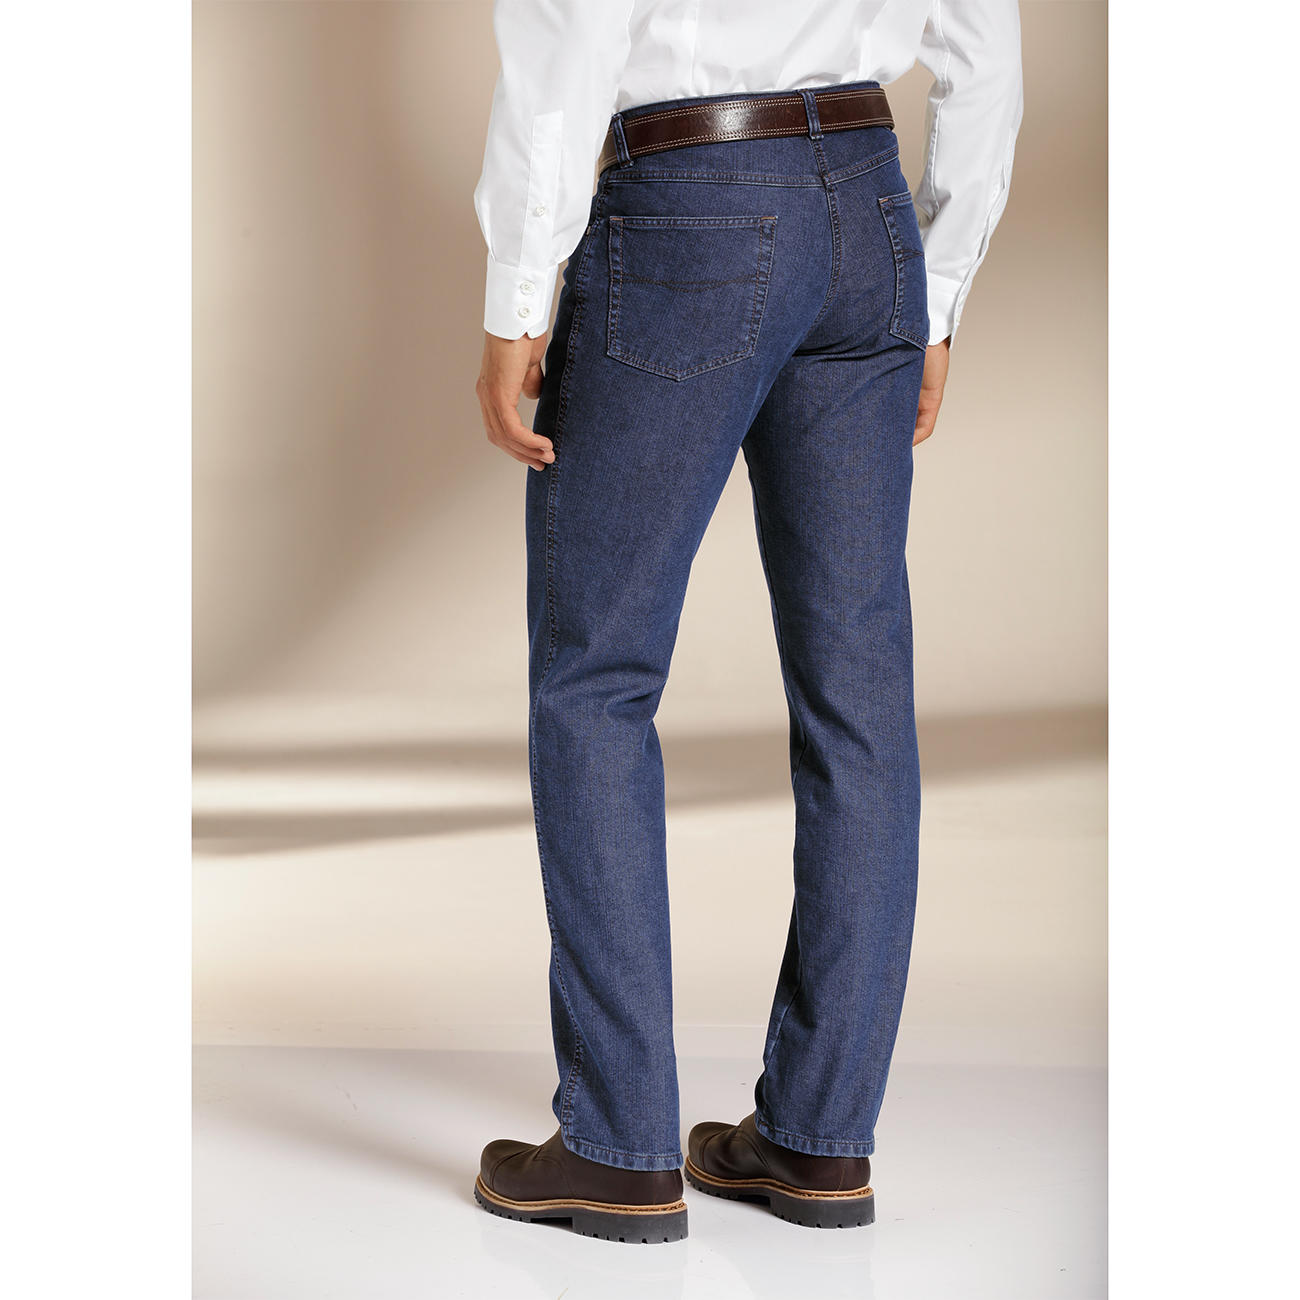 five pocket thermo jeans 3 jahre garantie pro idee. Black Bedroom Furniture Sets. Home Design Ideas